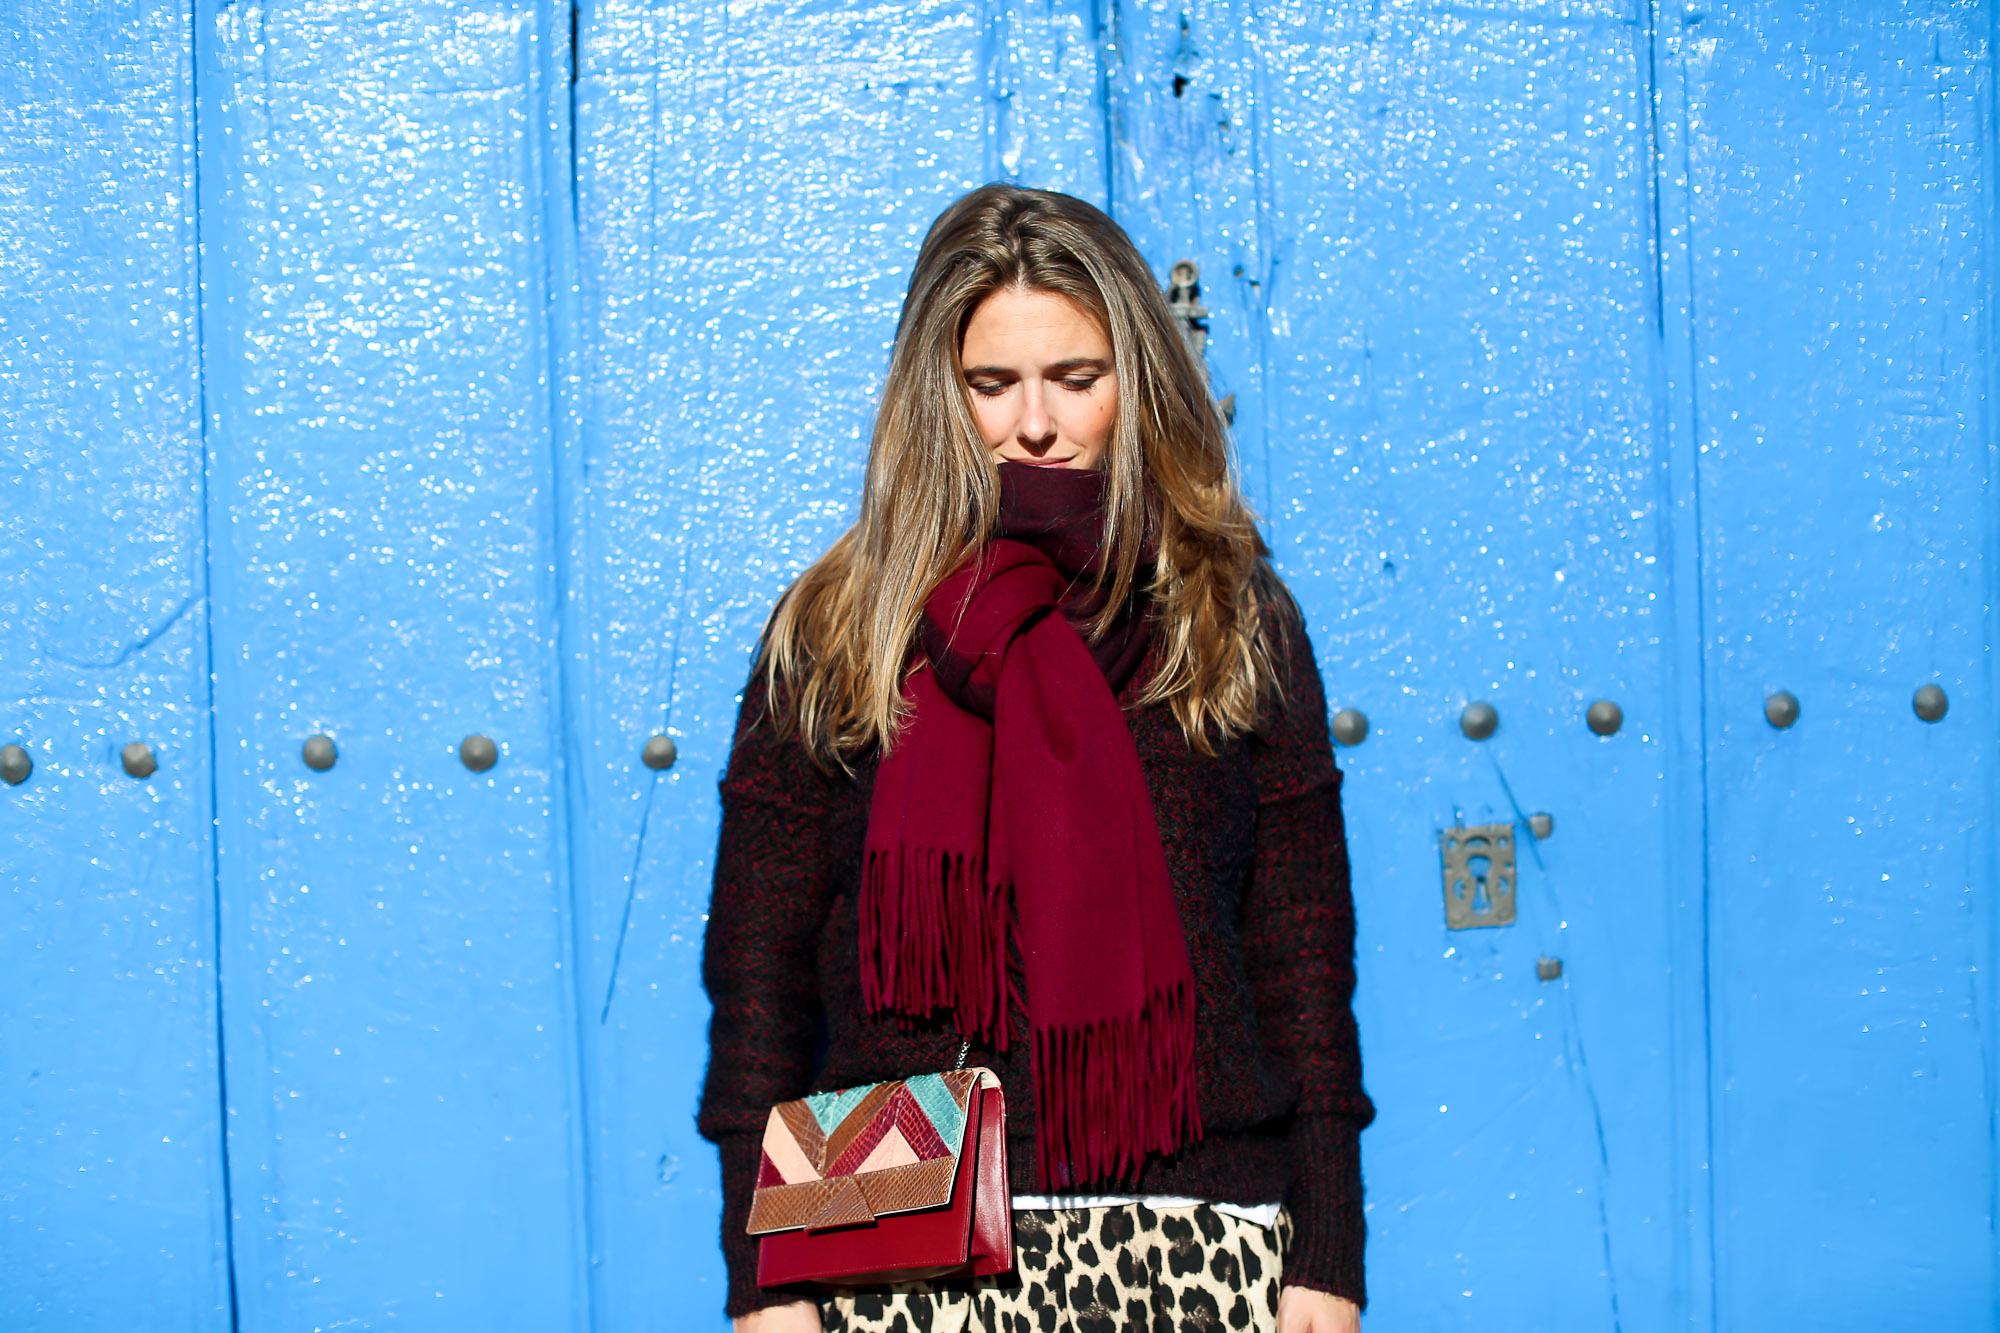 Clochet_streetstyle_fashionblogger_IKKSwoolknit_titamadridspigagranate_sandrobrogues_zaraleopardshorts-8